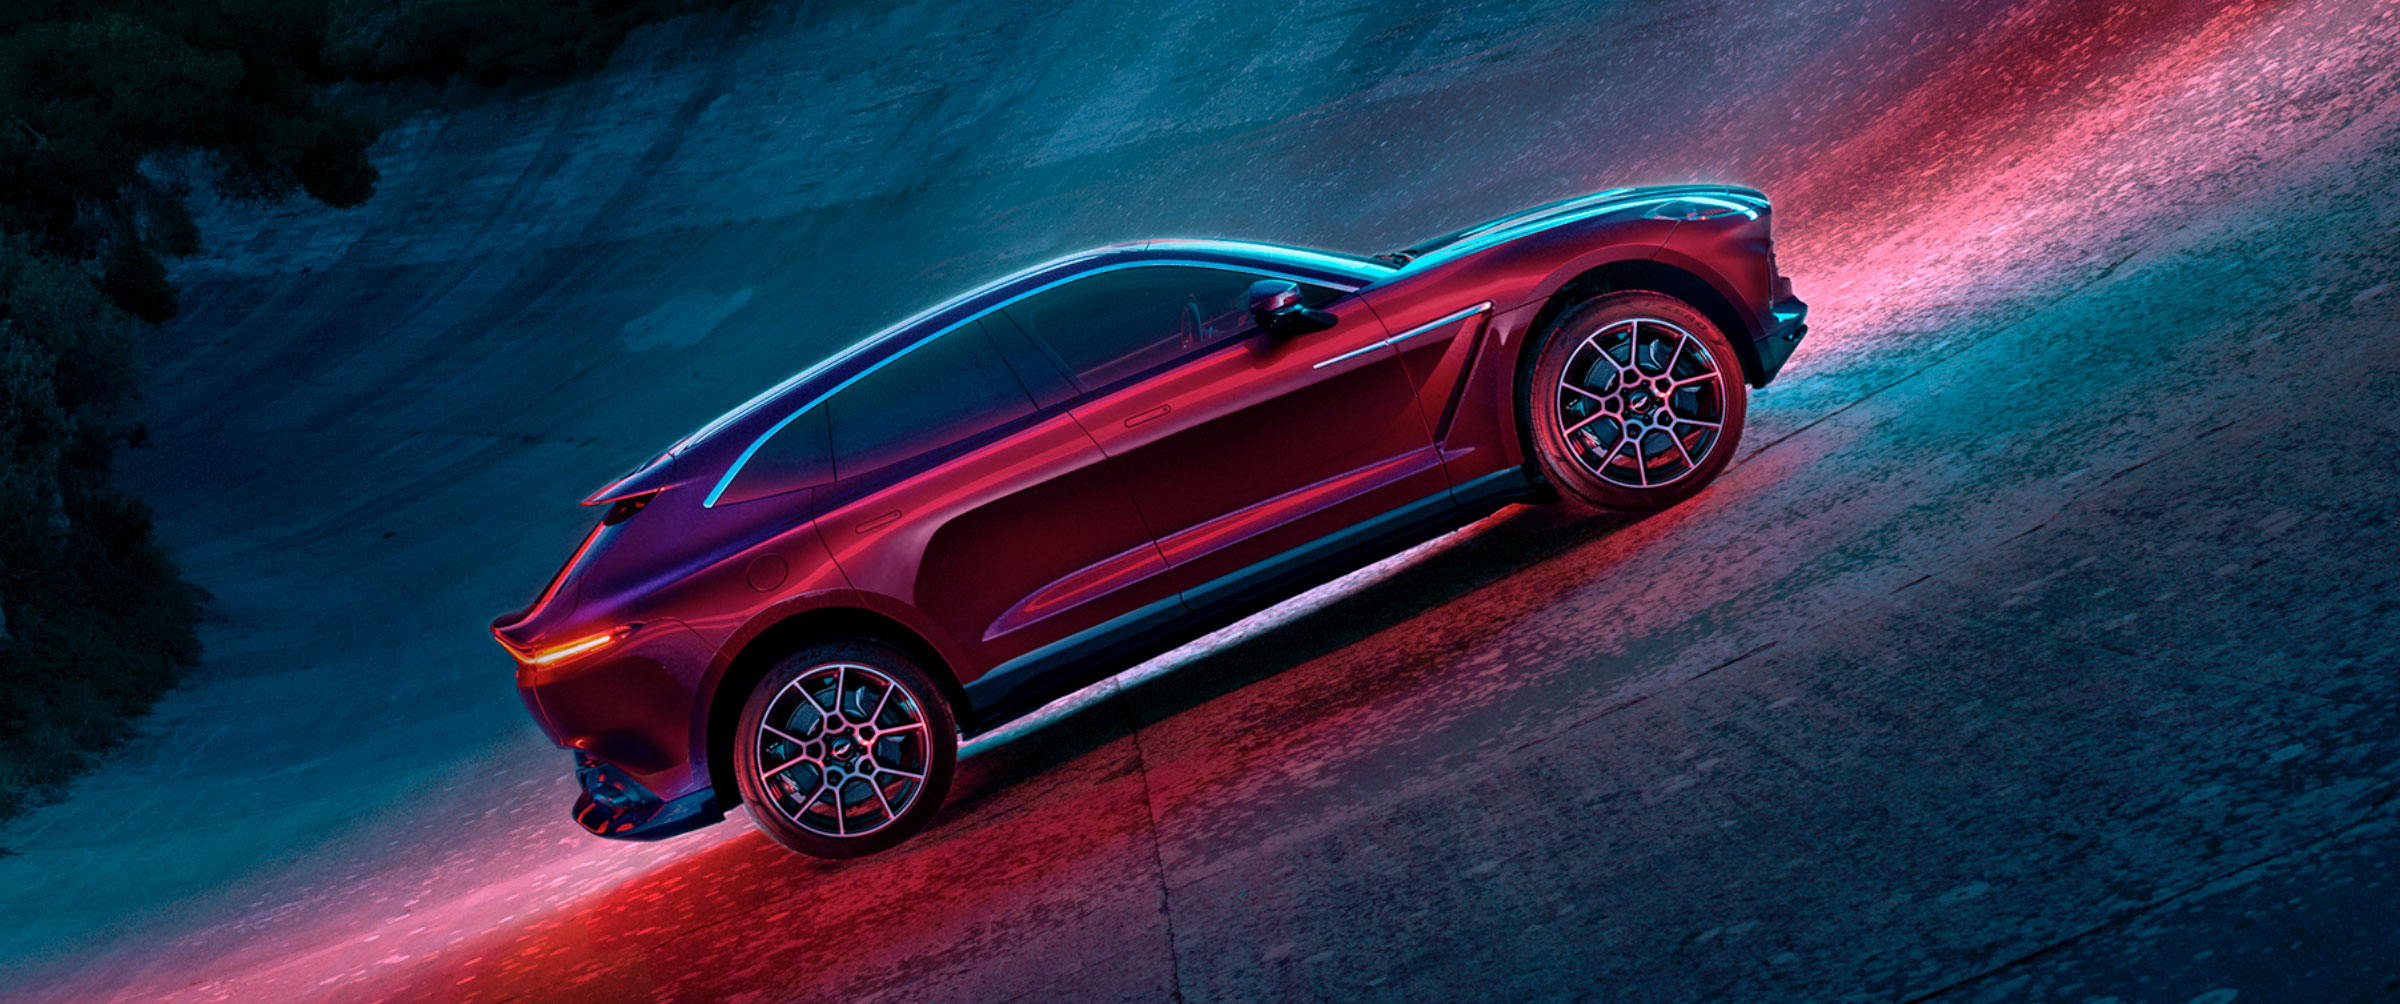 Dbx Beautiful Is Relentless Aston Martin Works